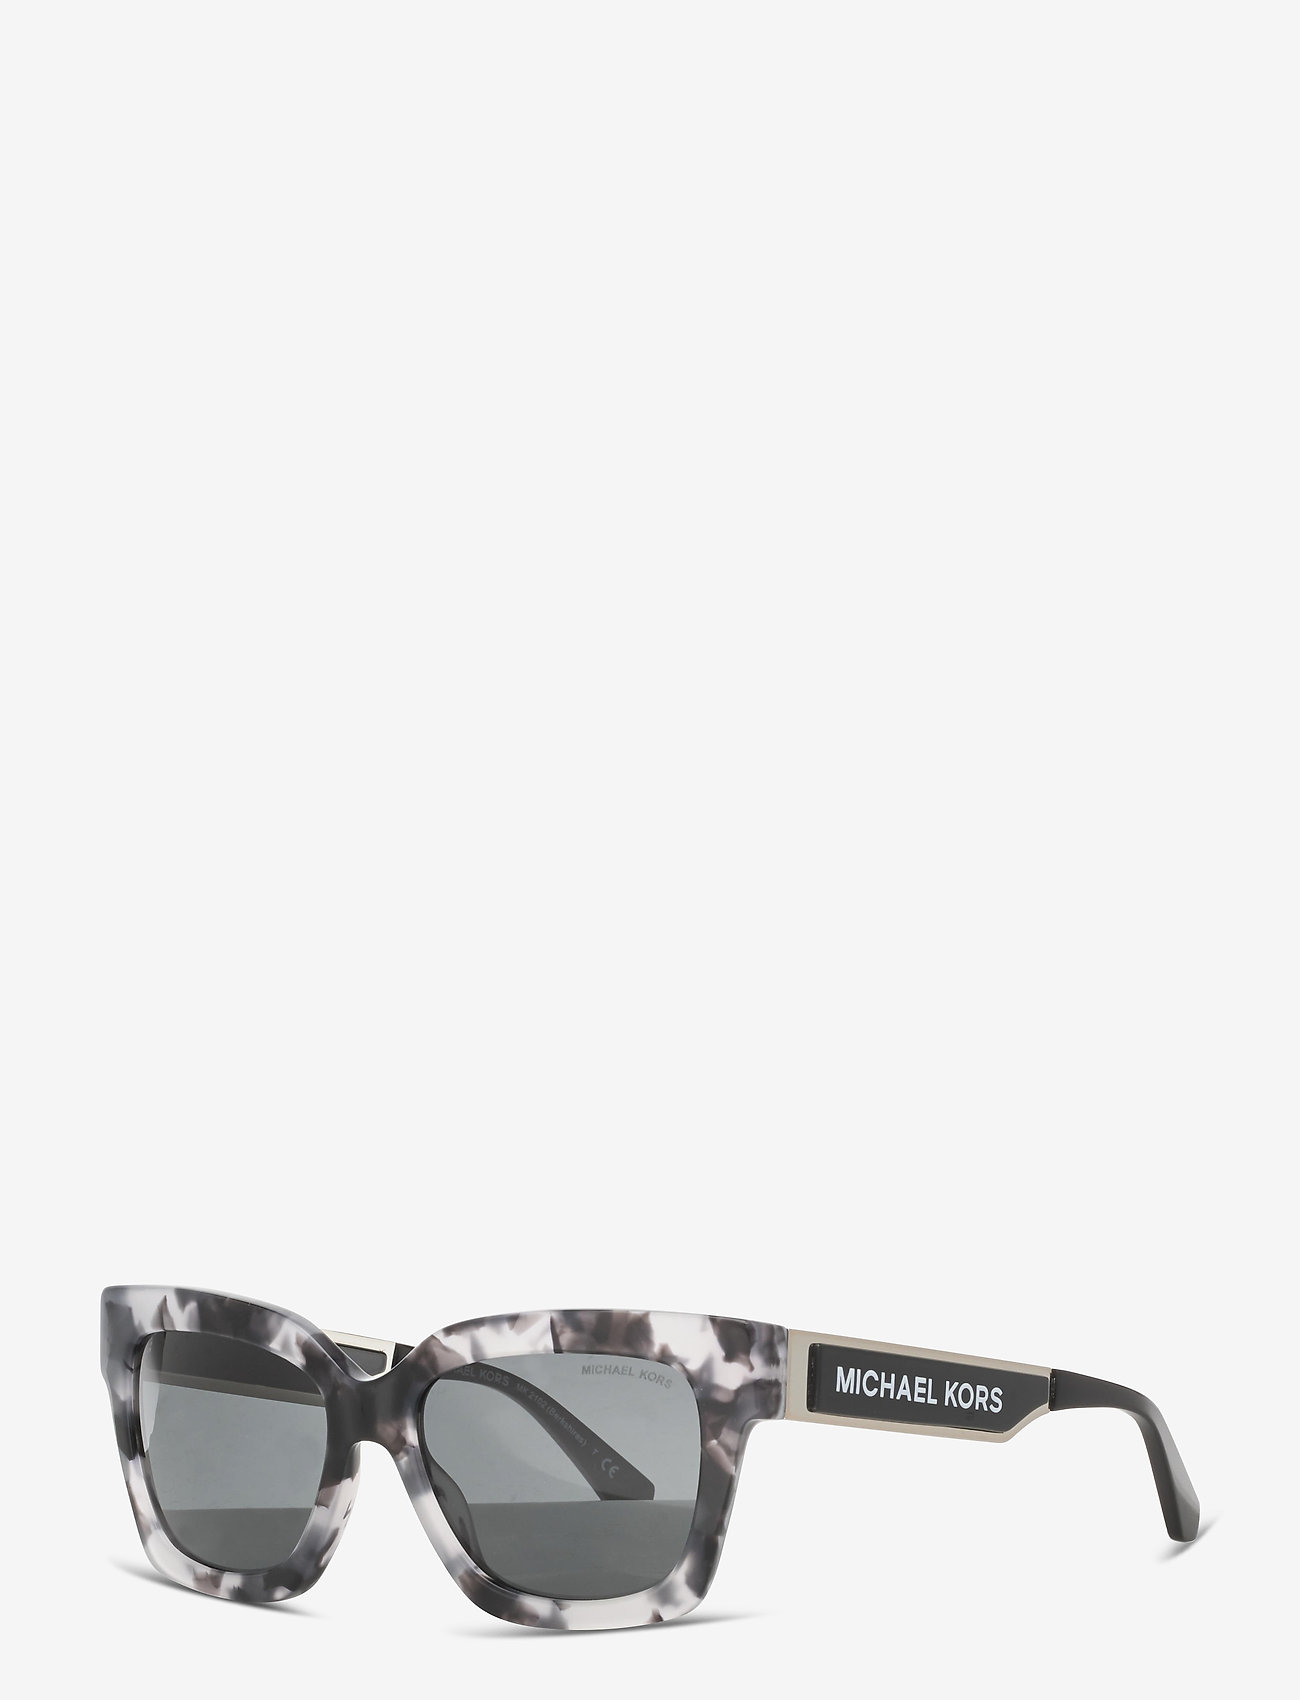 Michael Kors Sunglasses - Michael Kors Sunglasses - wayfarer - dark grey solid - 1